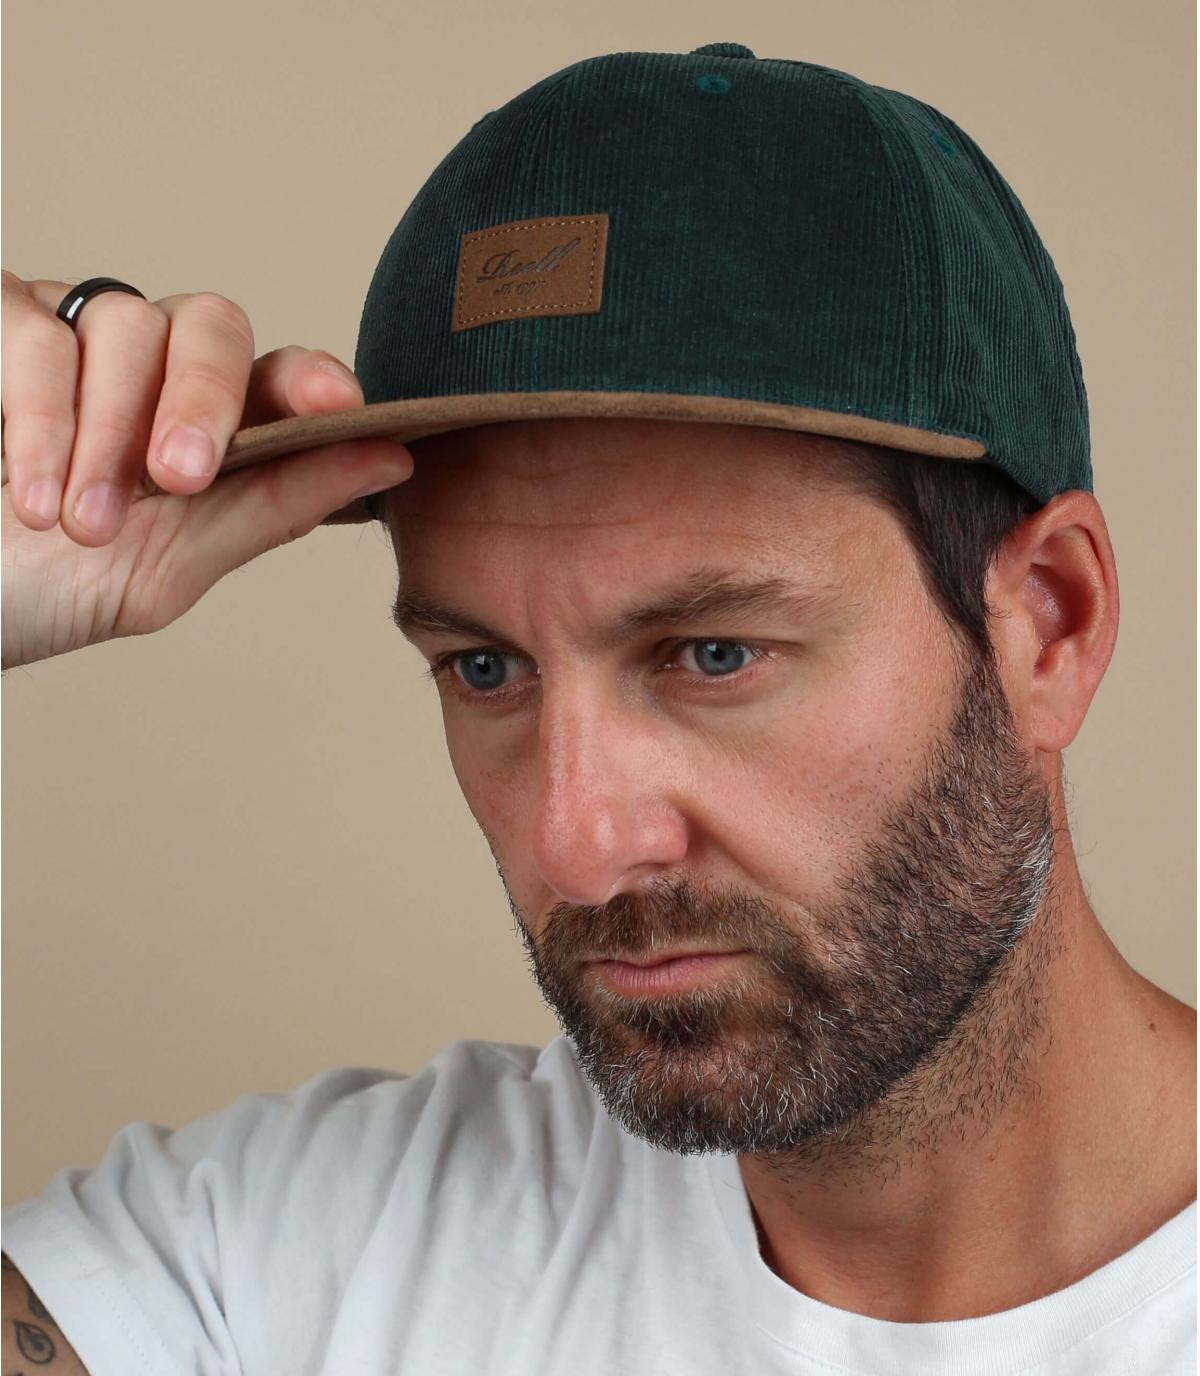 gorra verde Reell pana